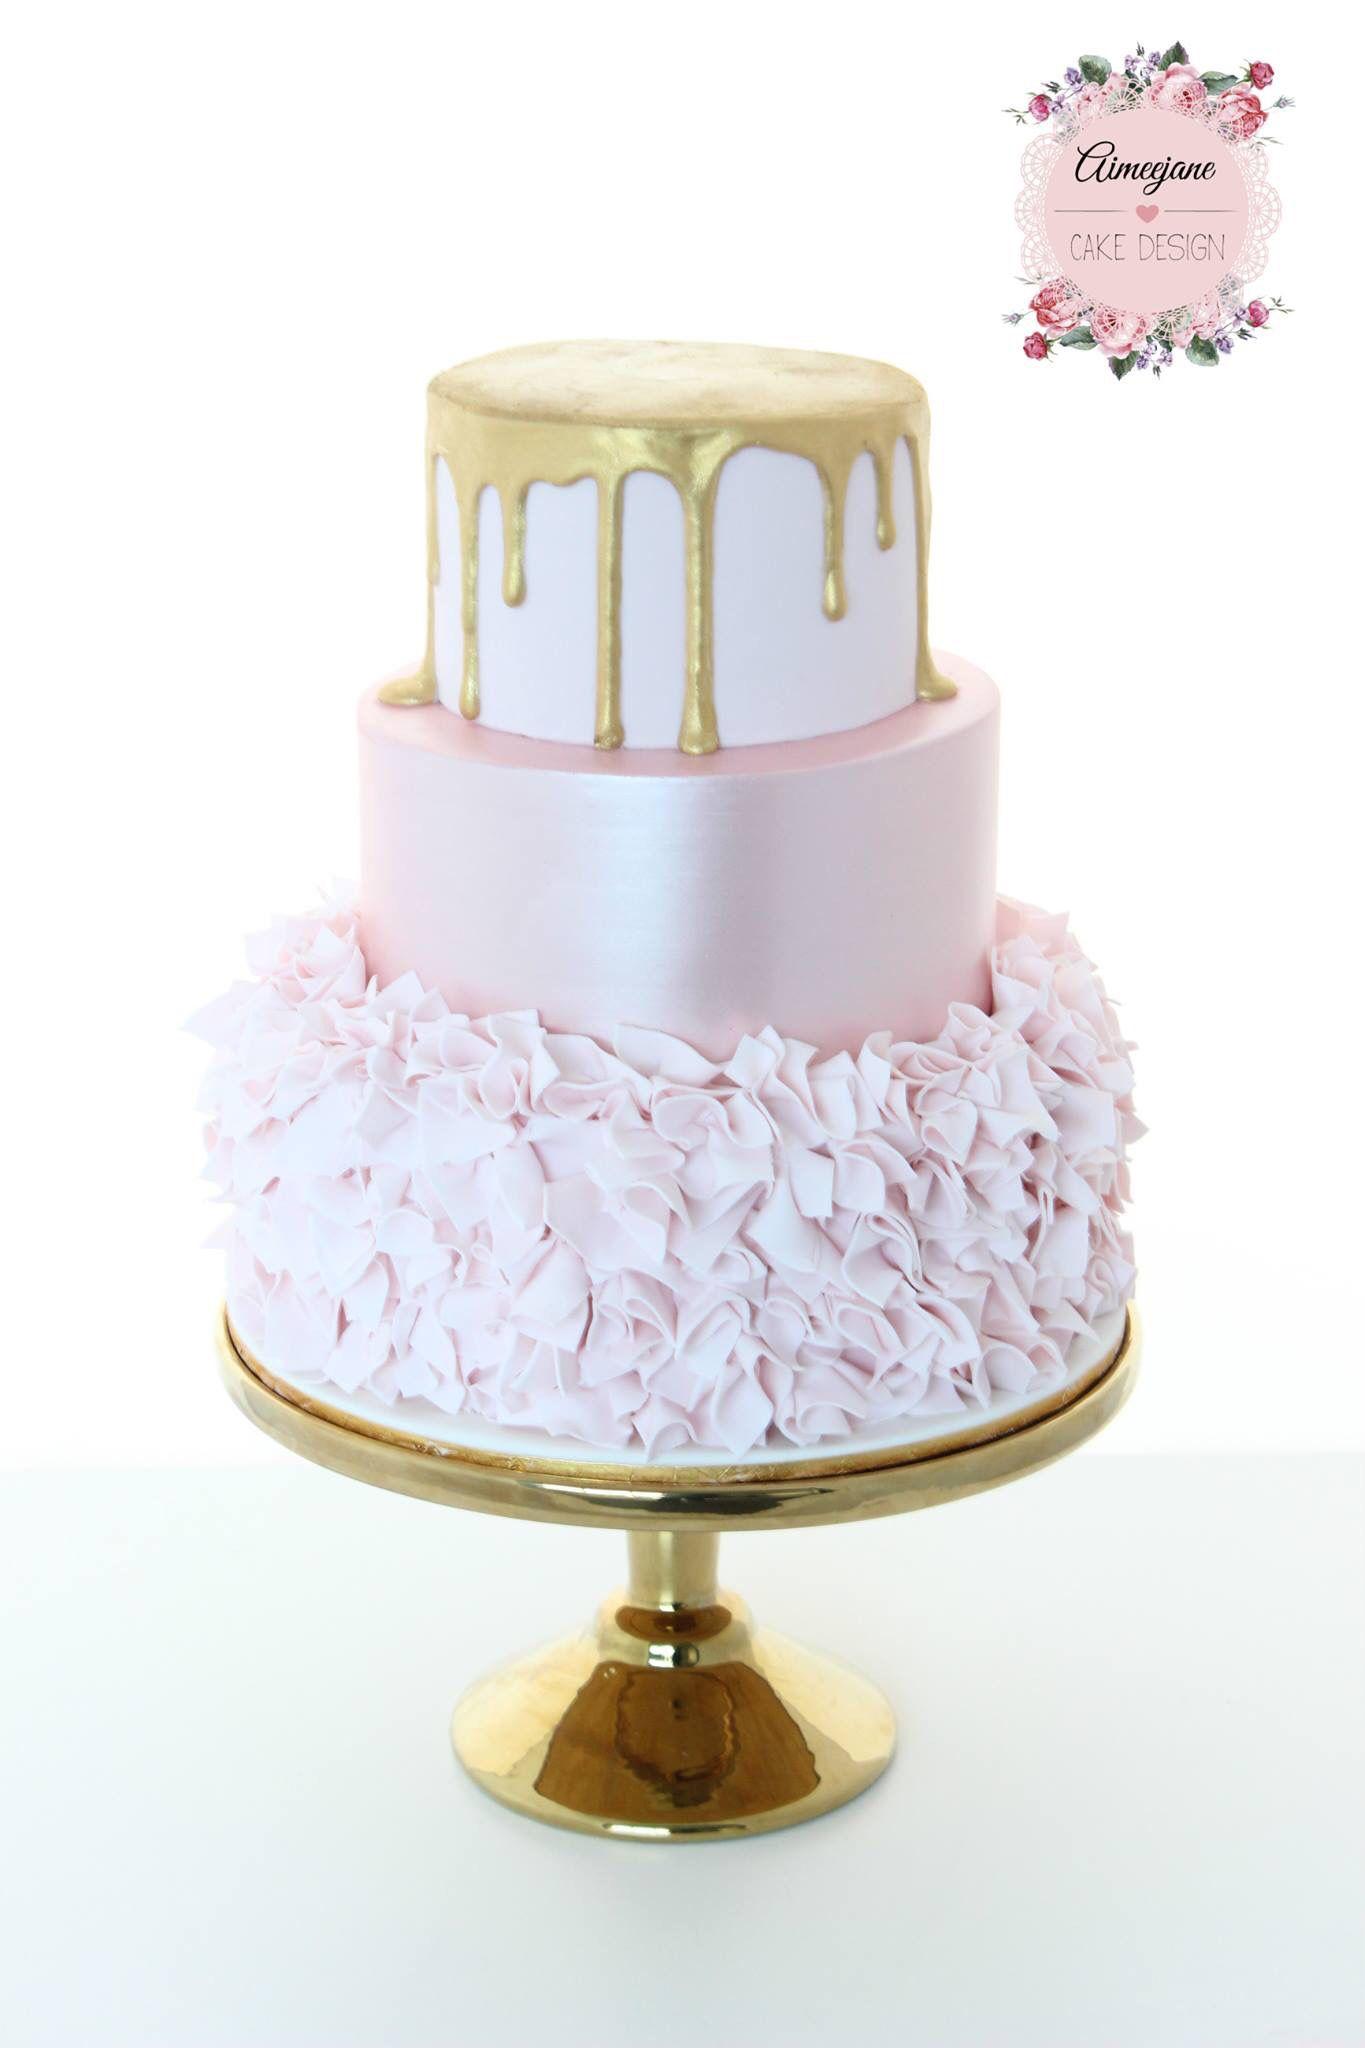 Aimeejane Cake Design